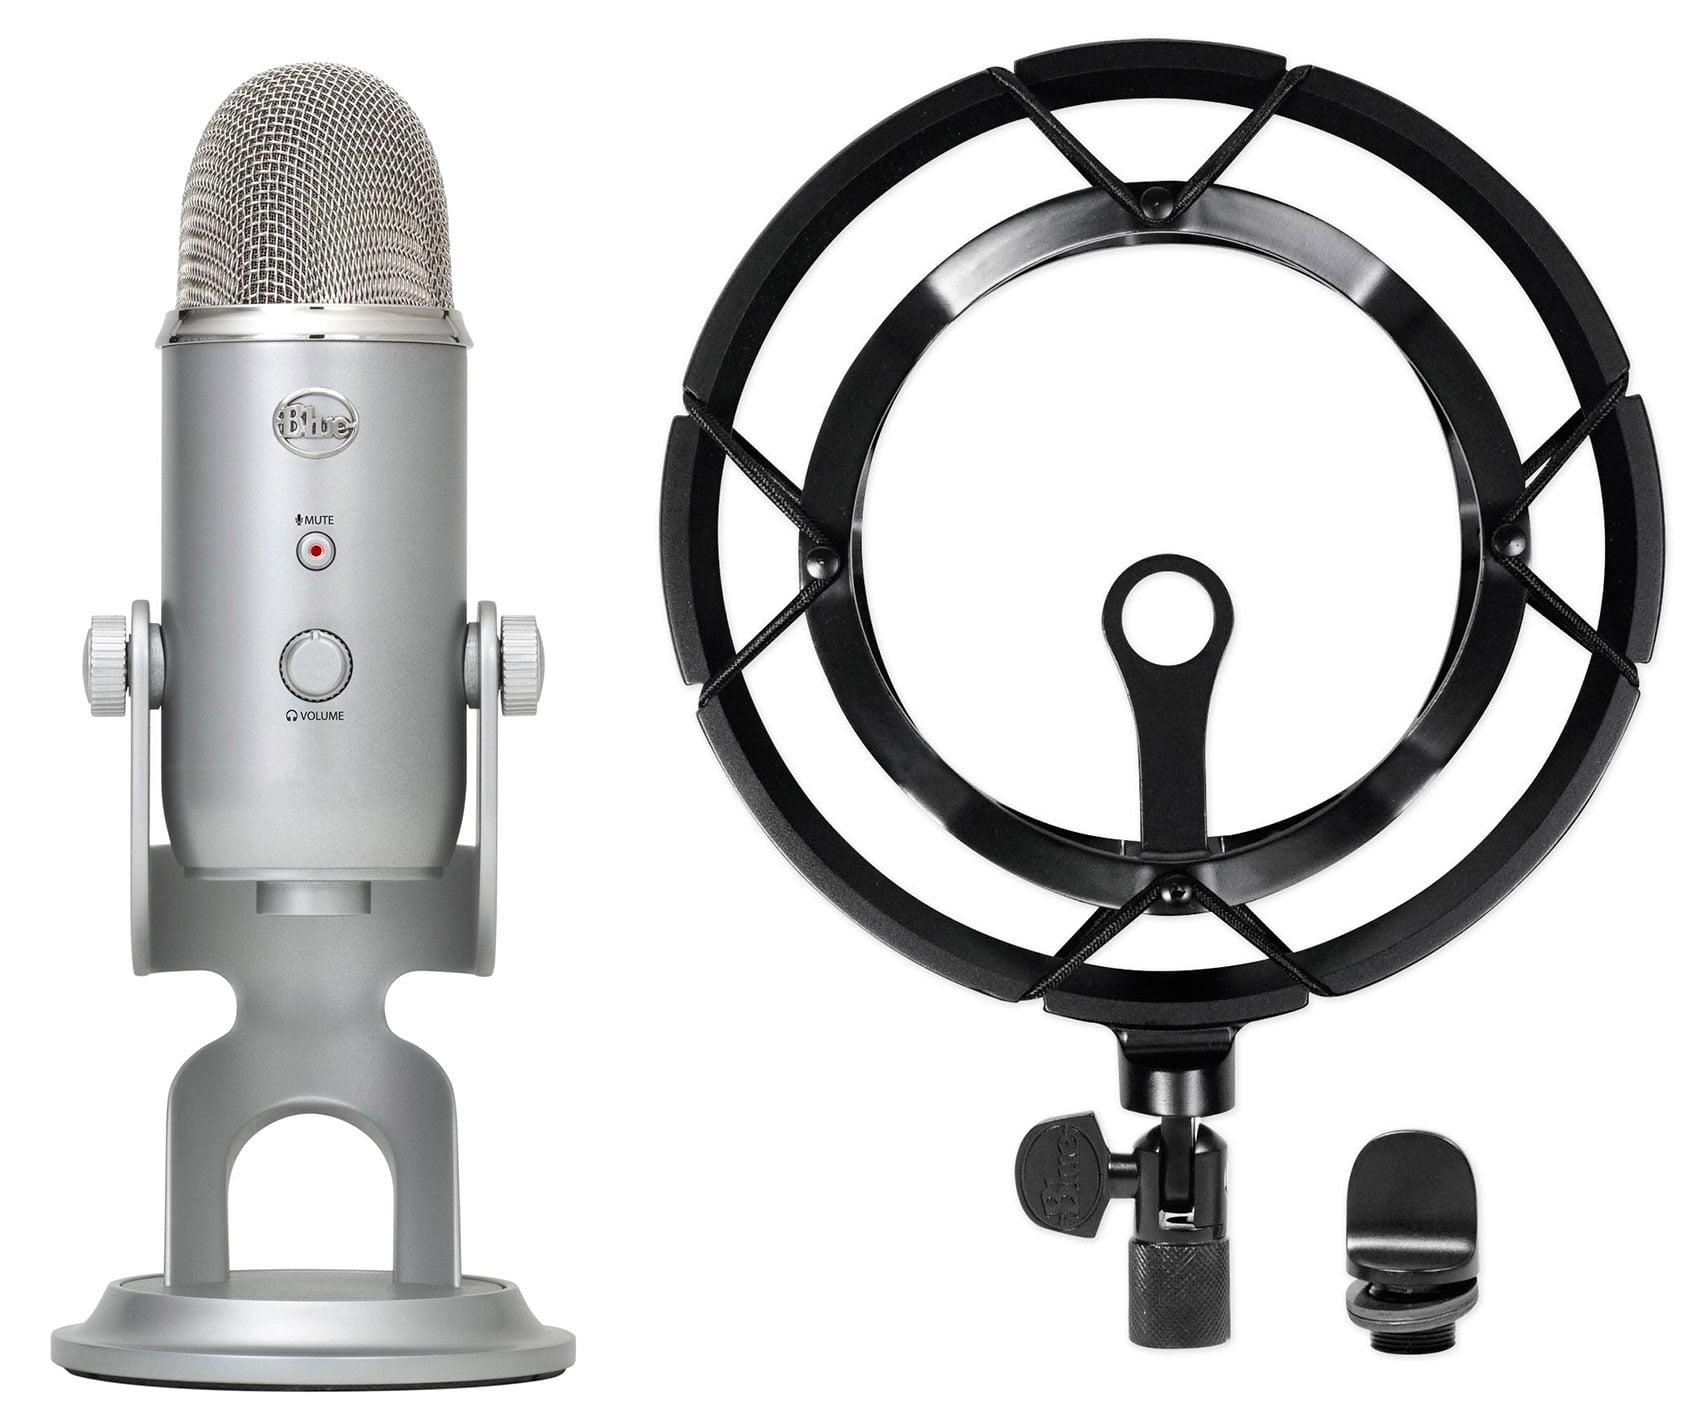 blue yeti studio usb recording microphone podcast podcasting mic shockmount. Black Bedroom Furniture Sets. Home Design Ideas